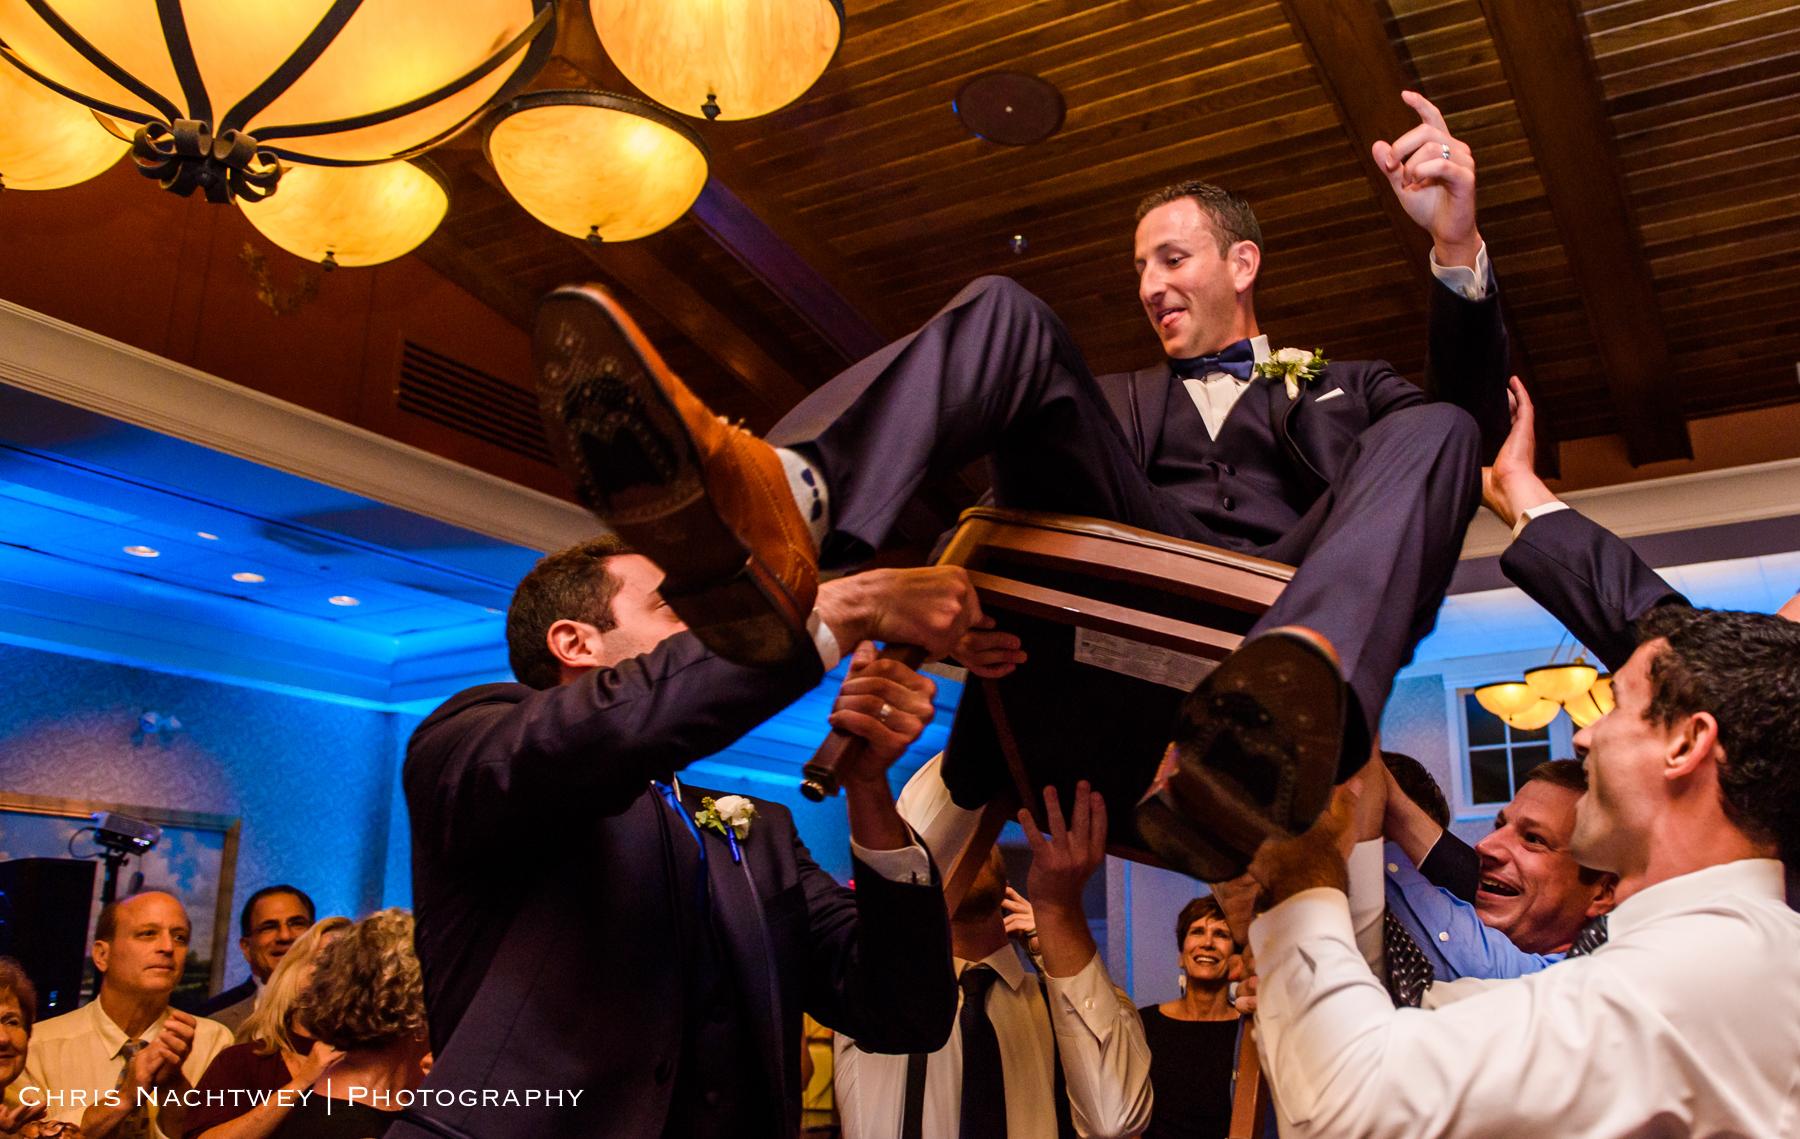 wedding-lake-of-isles-photos-chris-nachtwey-photography-2019-56.jpg